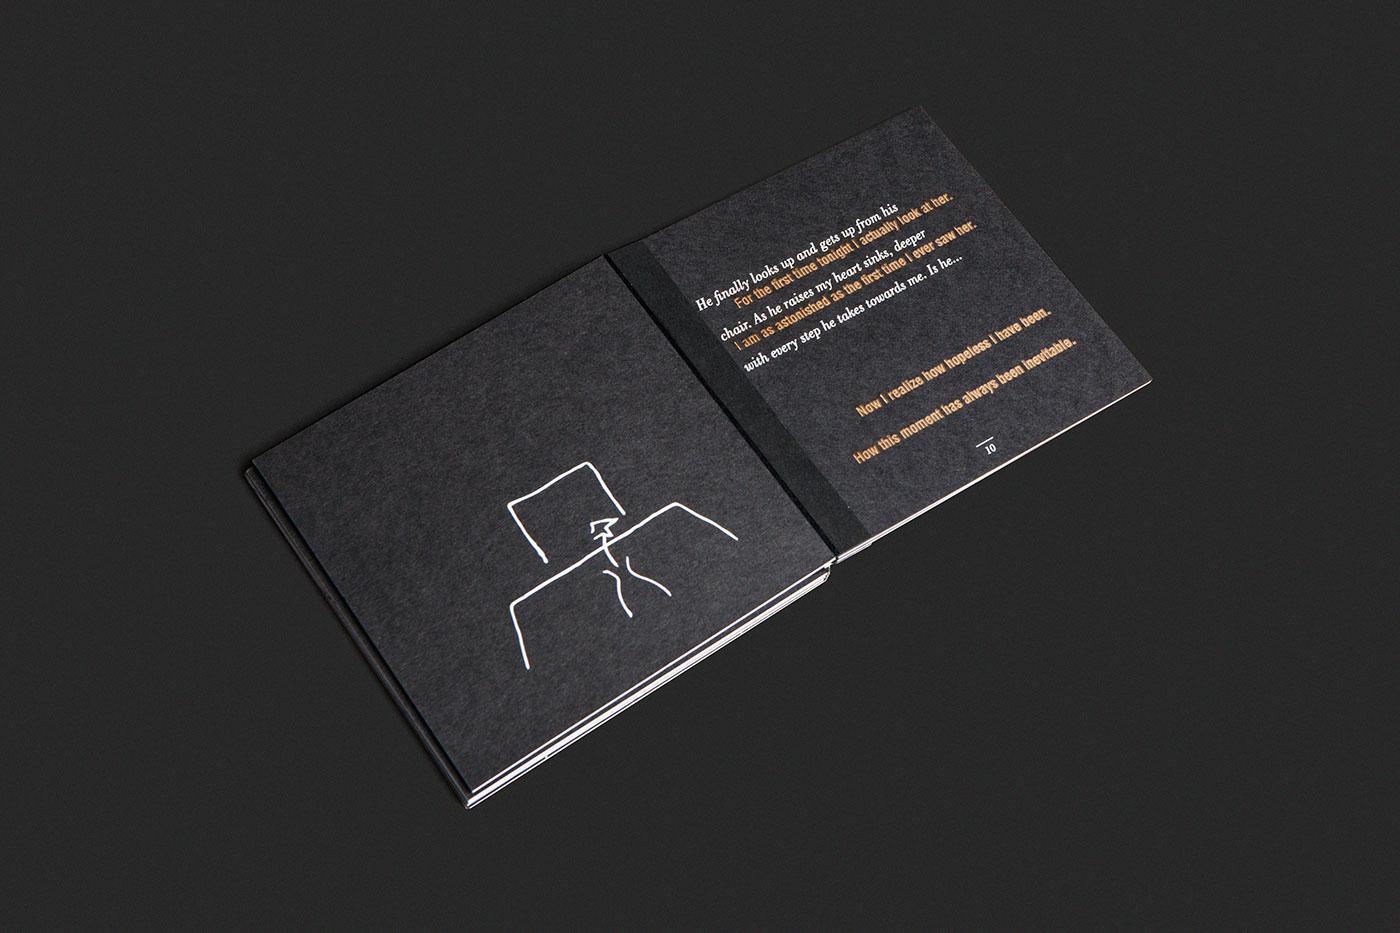 black,book,engagement,marriage,date,girlfriend,boyfriend,Love,sva,mfa,MFA Design